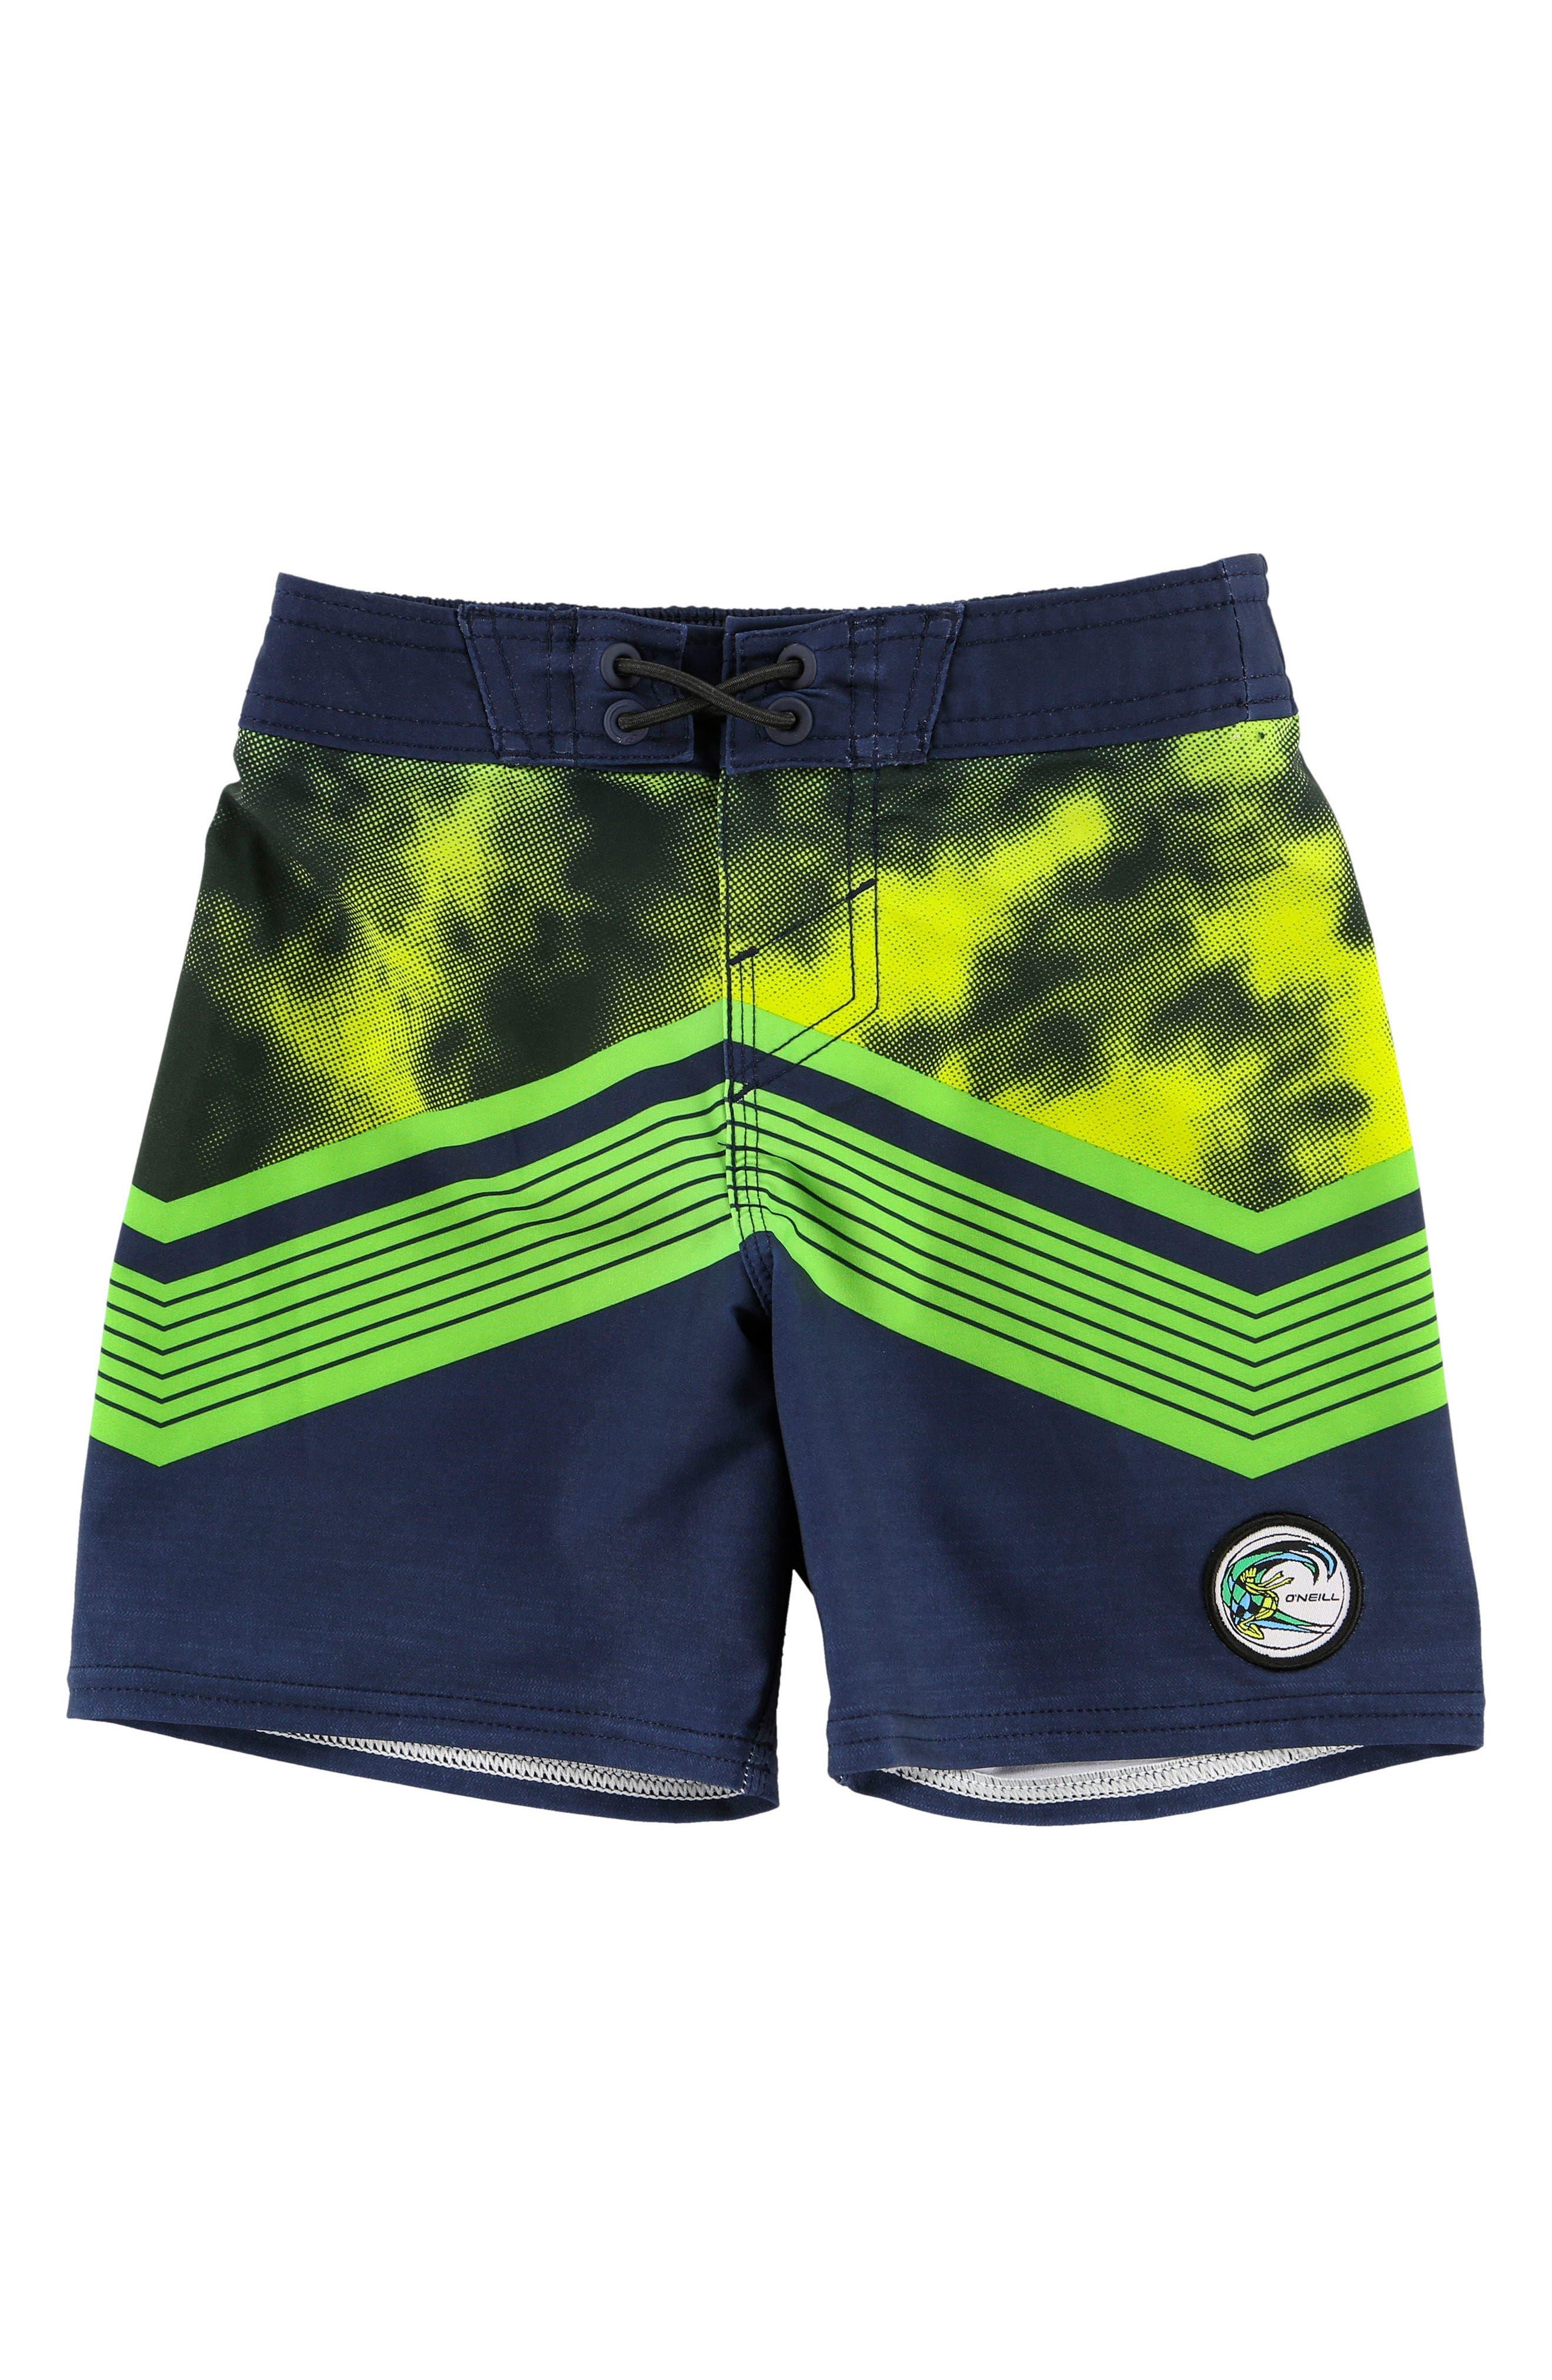 Hyperfreak Imagine Board Shorts,                         Main,                         color, 410